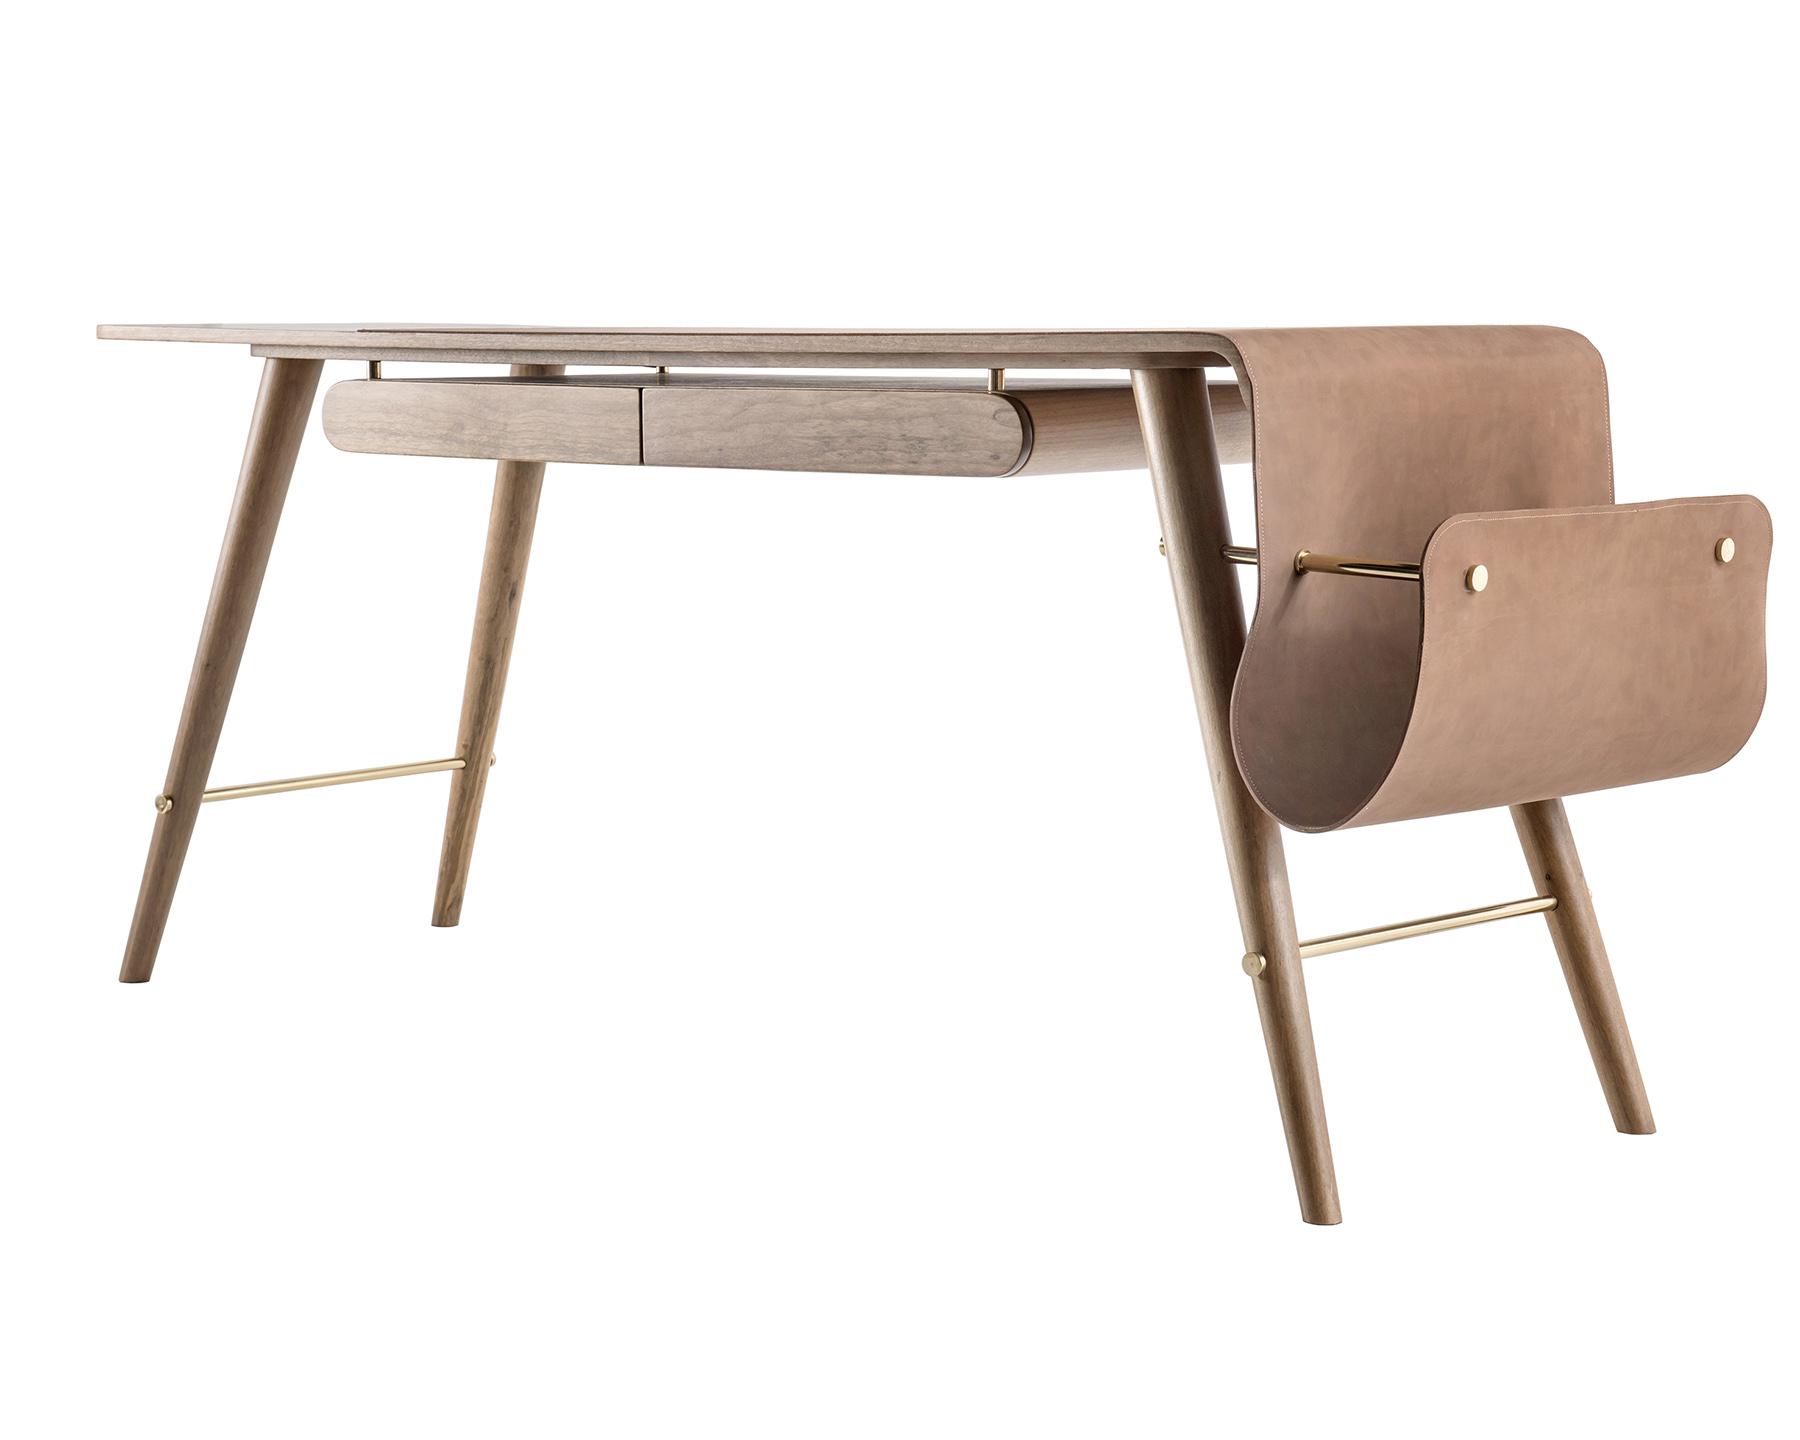 12-premio-mcb-2016-mobiliario-3-lugar-produto-escrivaninha-sao-basilio-foto-claudio-fonseca